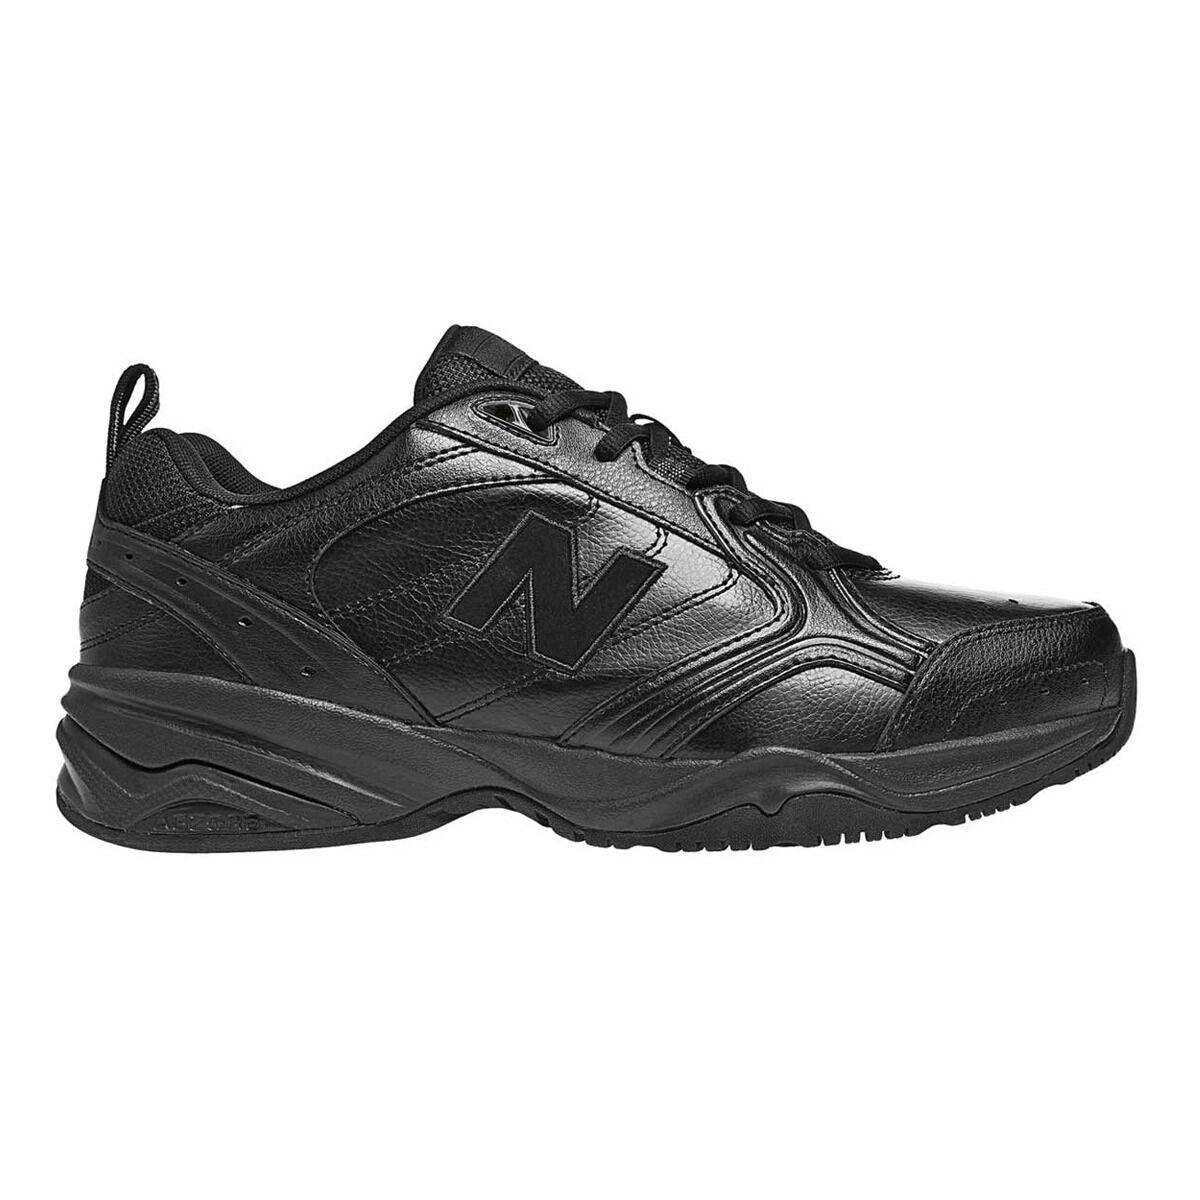 new balance 624 men's cross training shoes